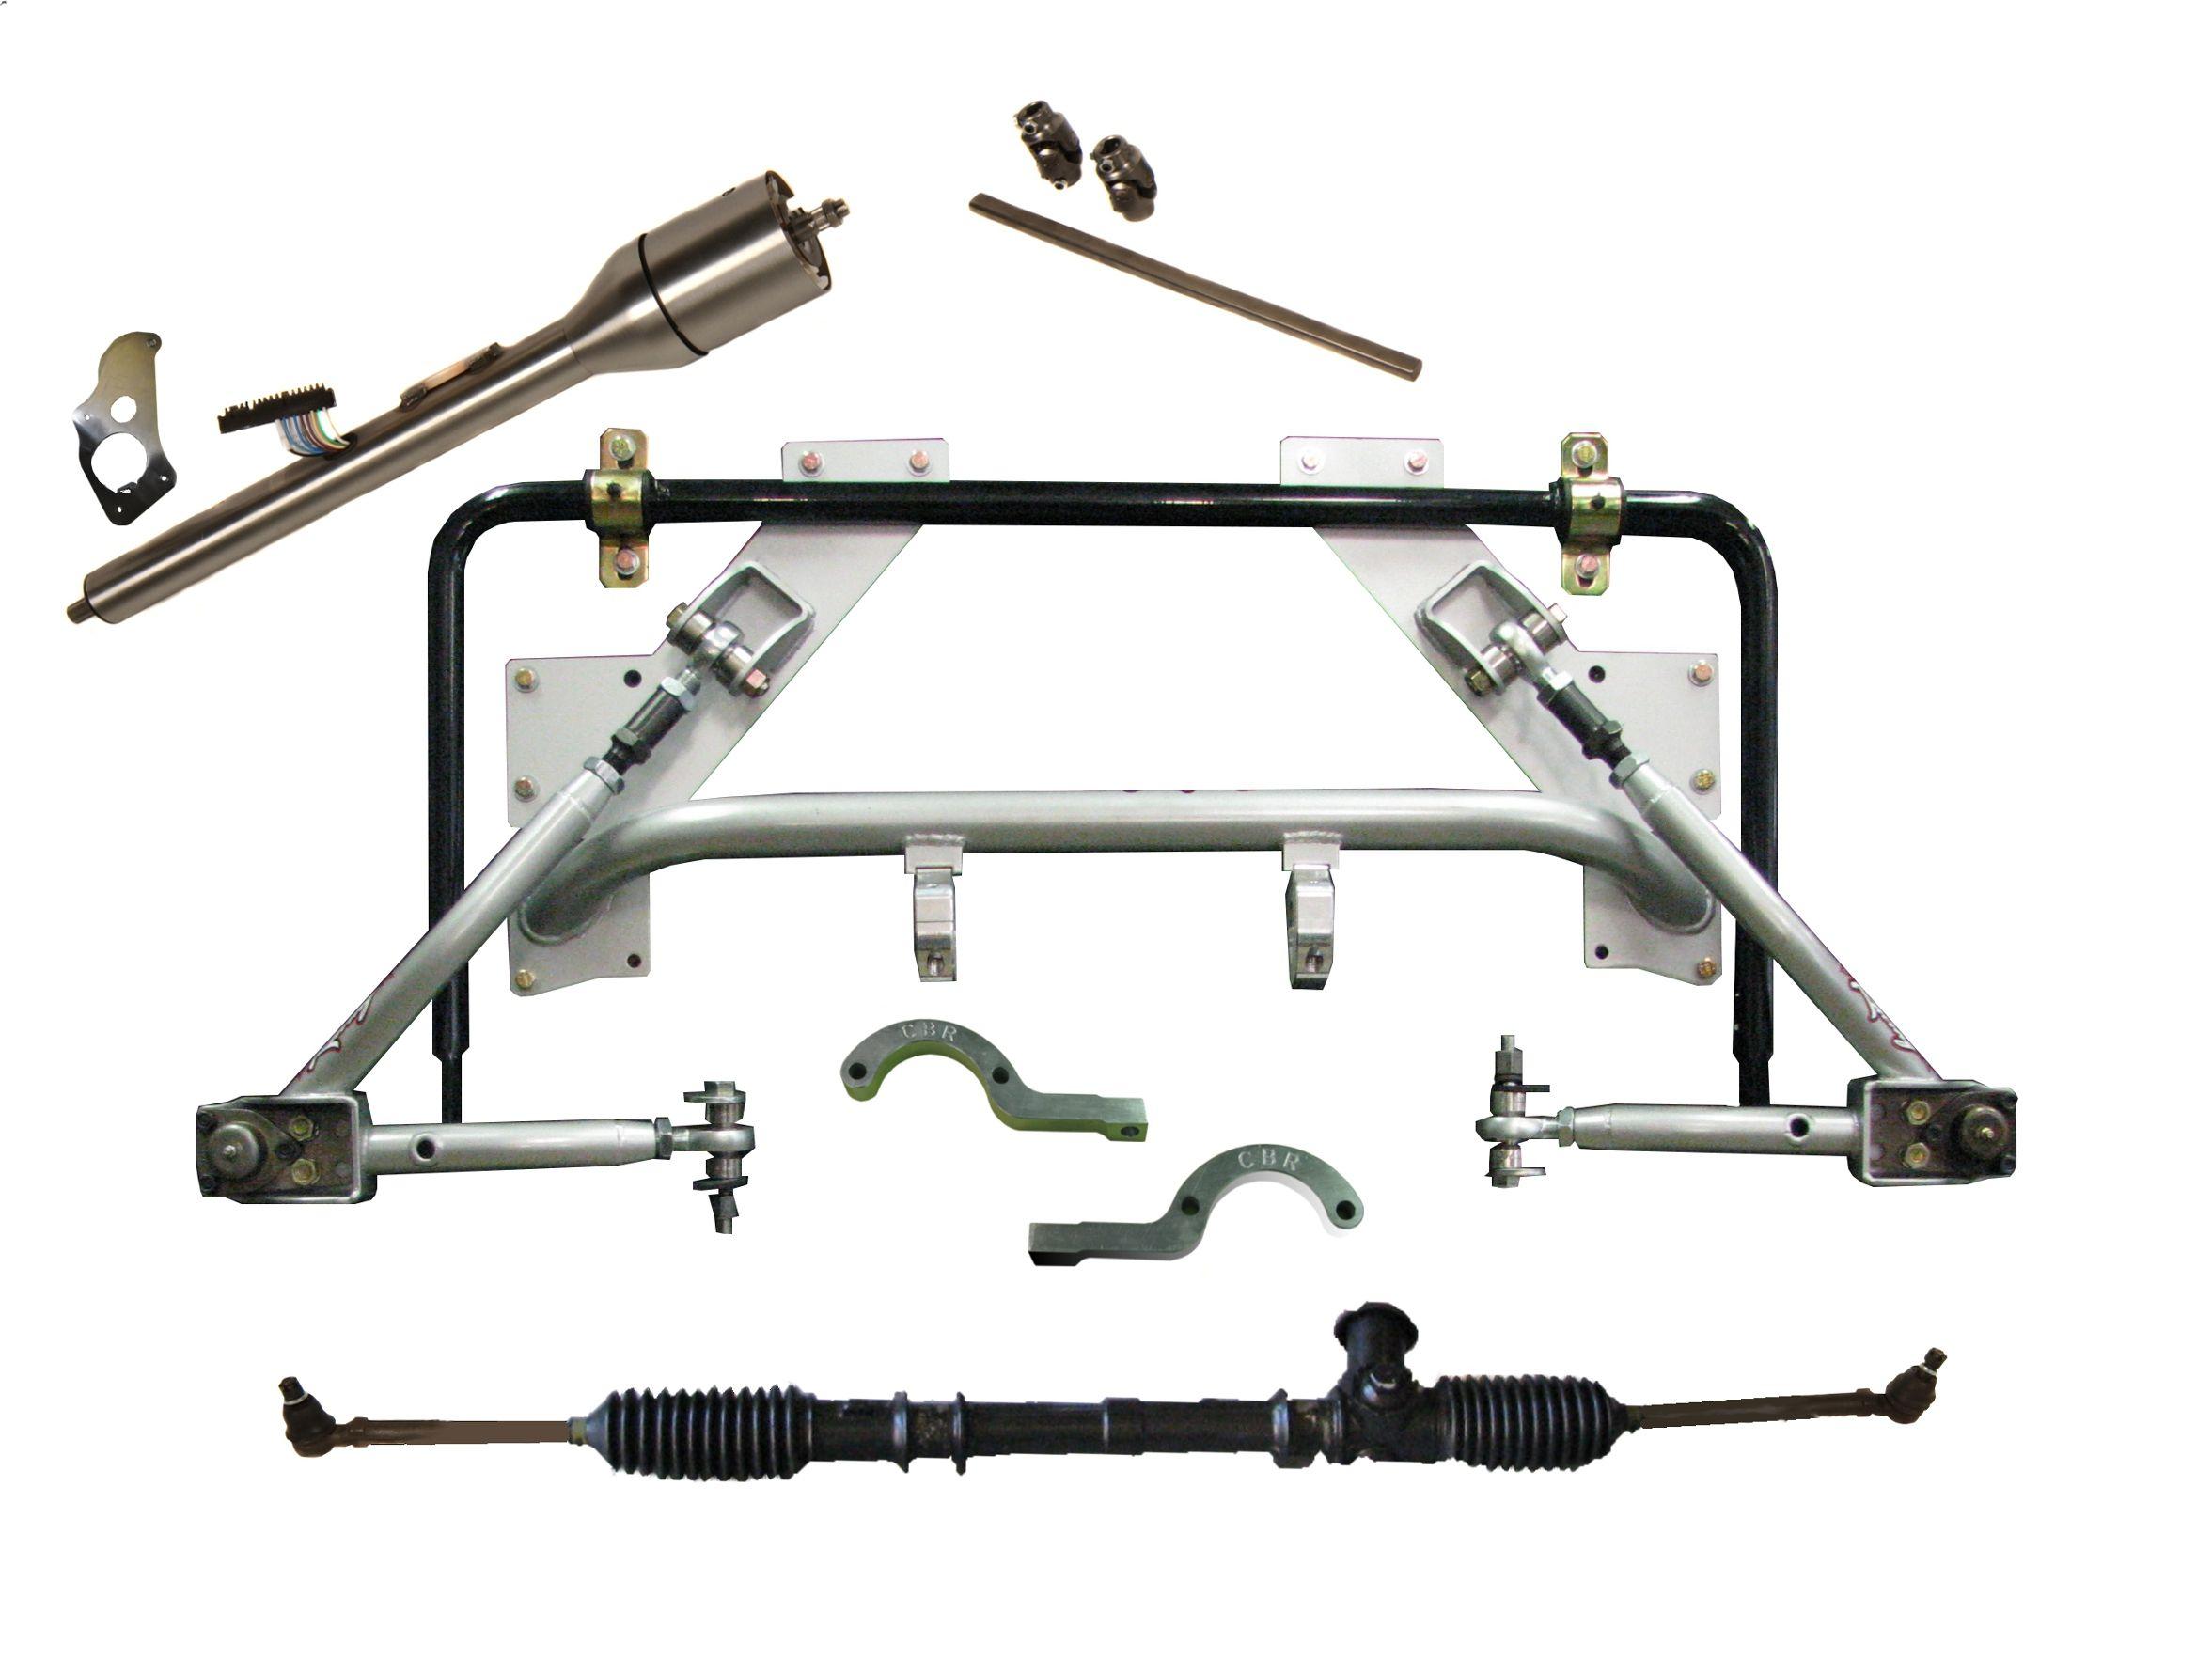 lemans gto pin pinion pontiac rack tempest kit